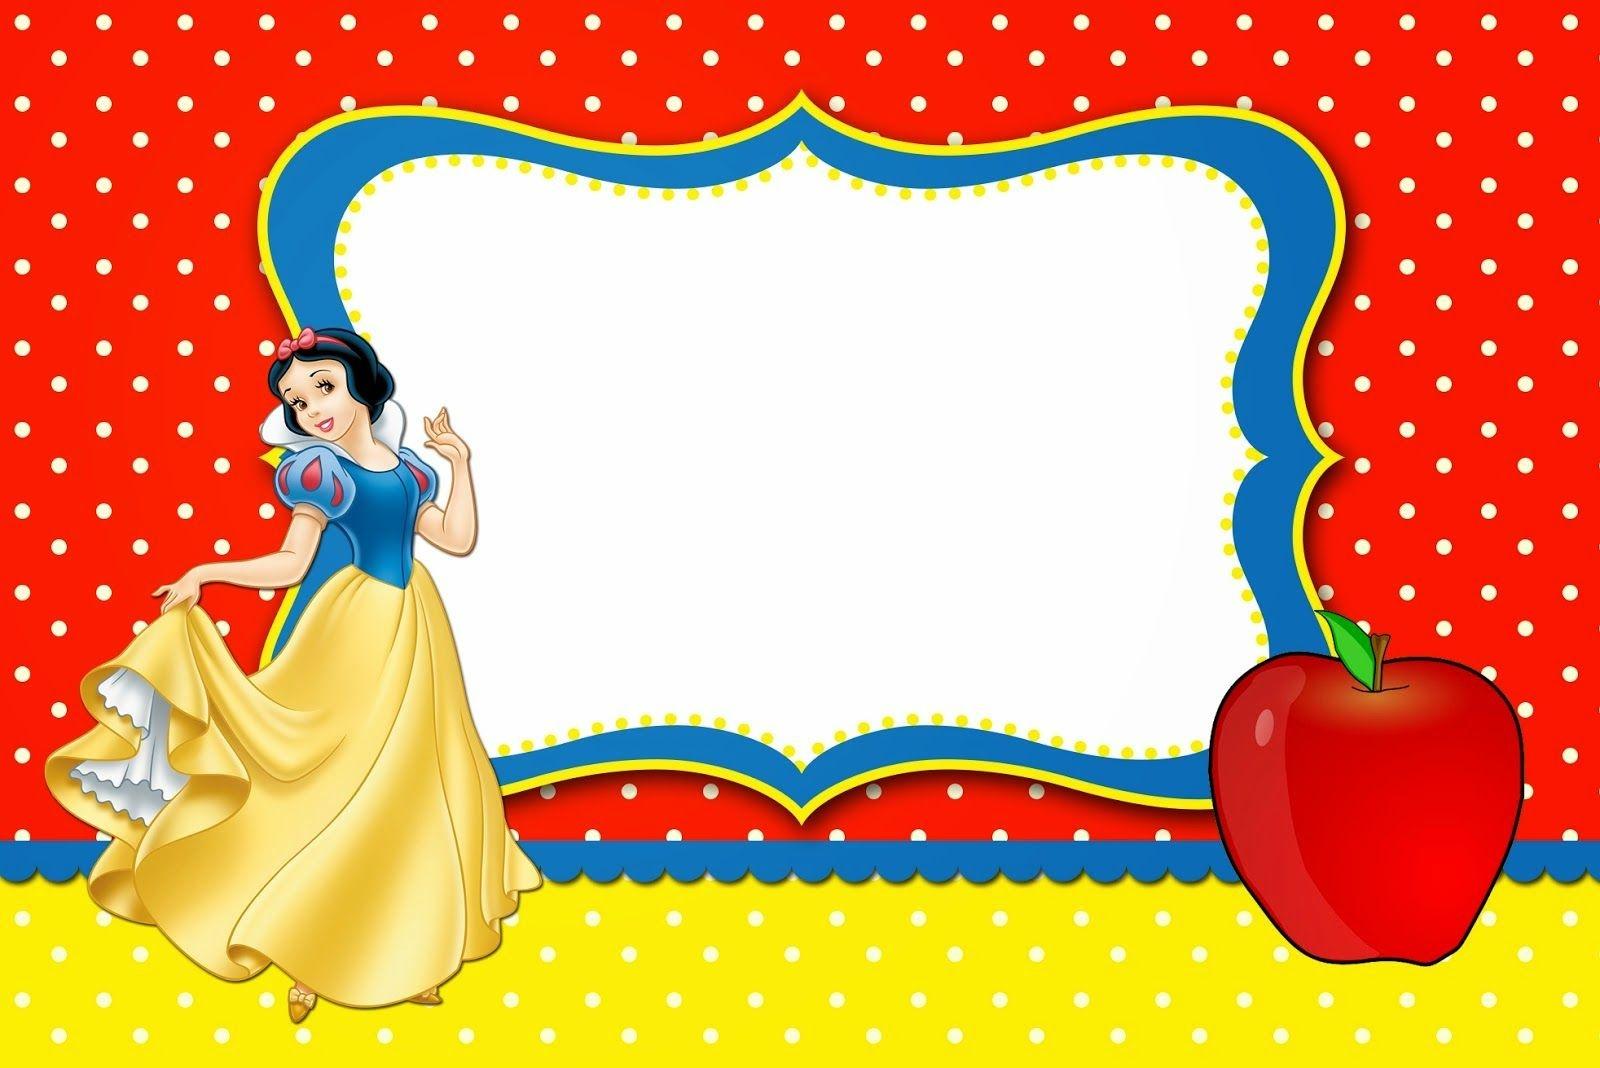 Snow White: Free Printable Invitations, Labels Or Cards. | Birthday - Snow White Invitations Free Printable